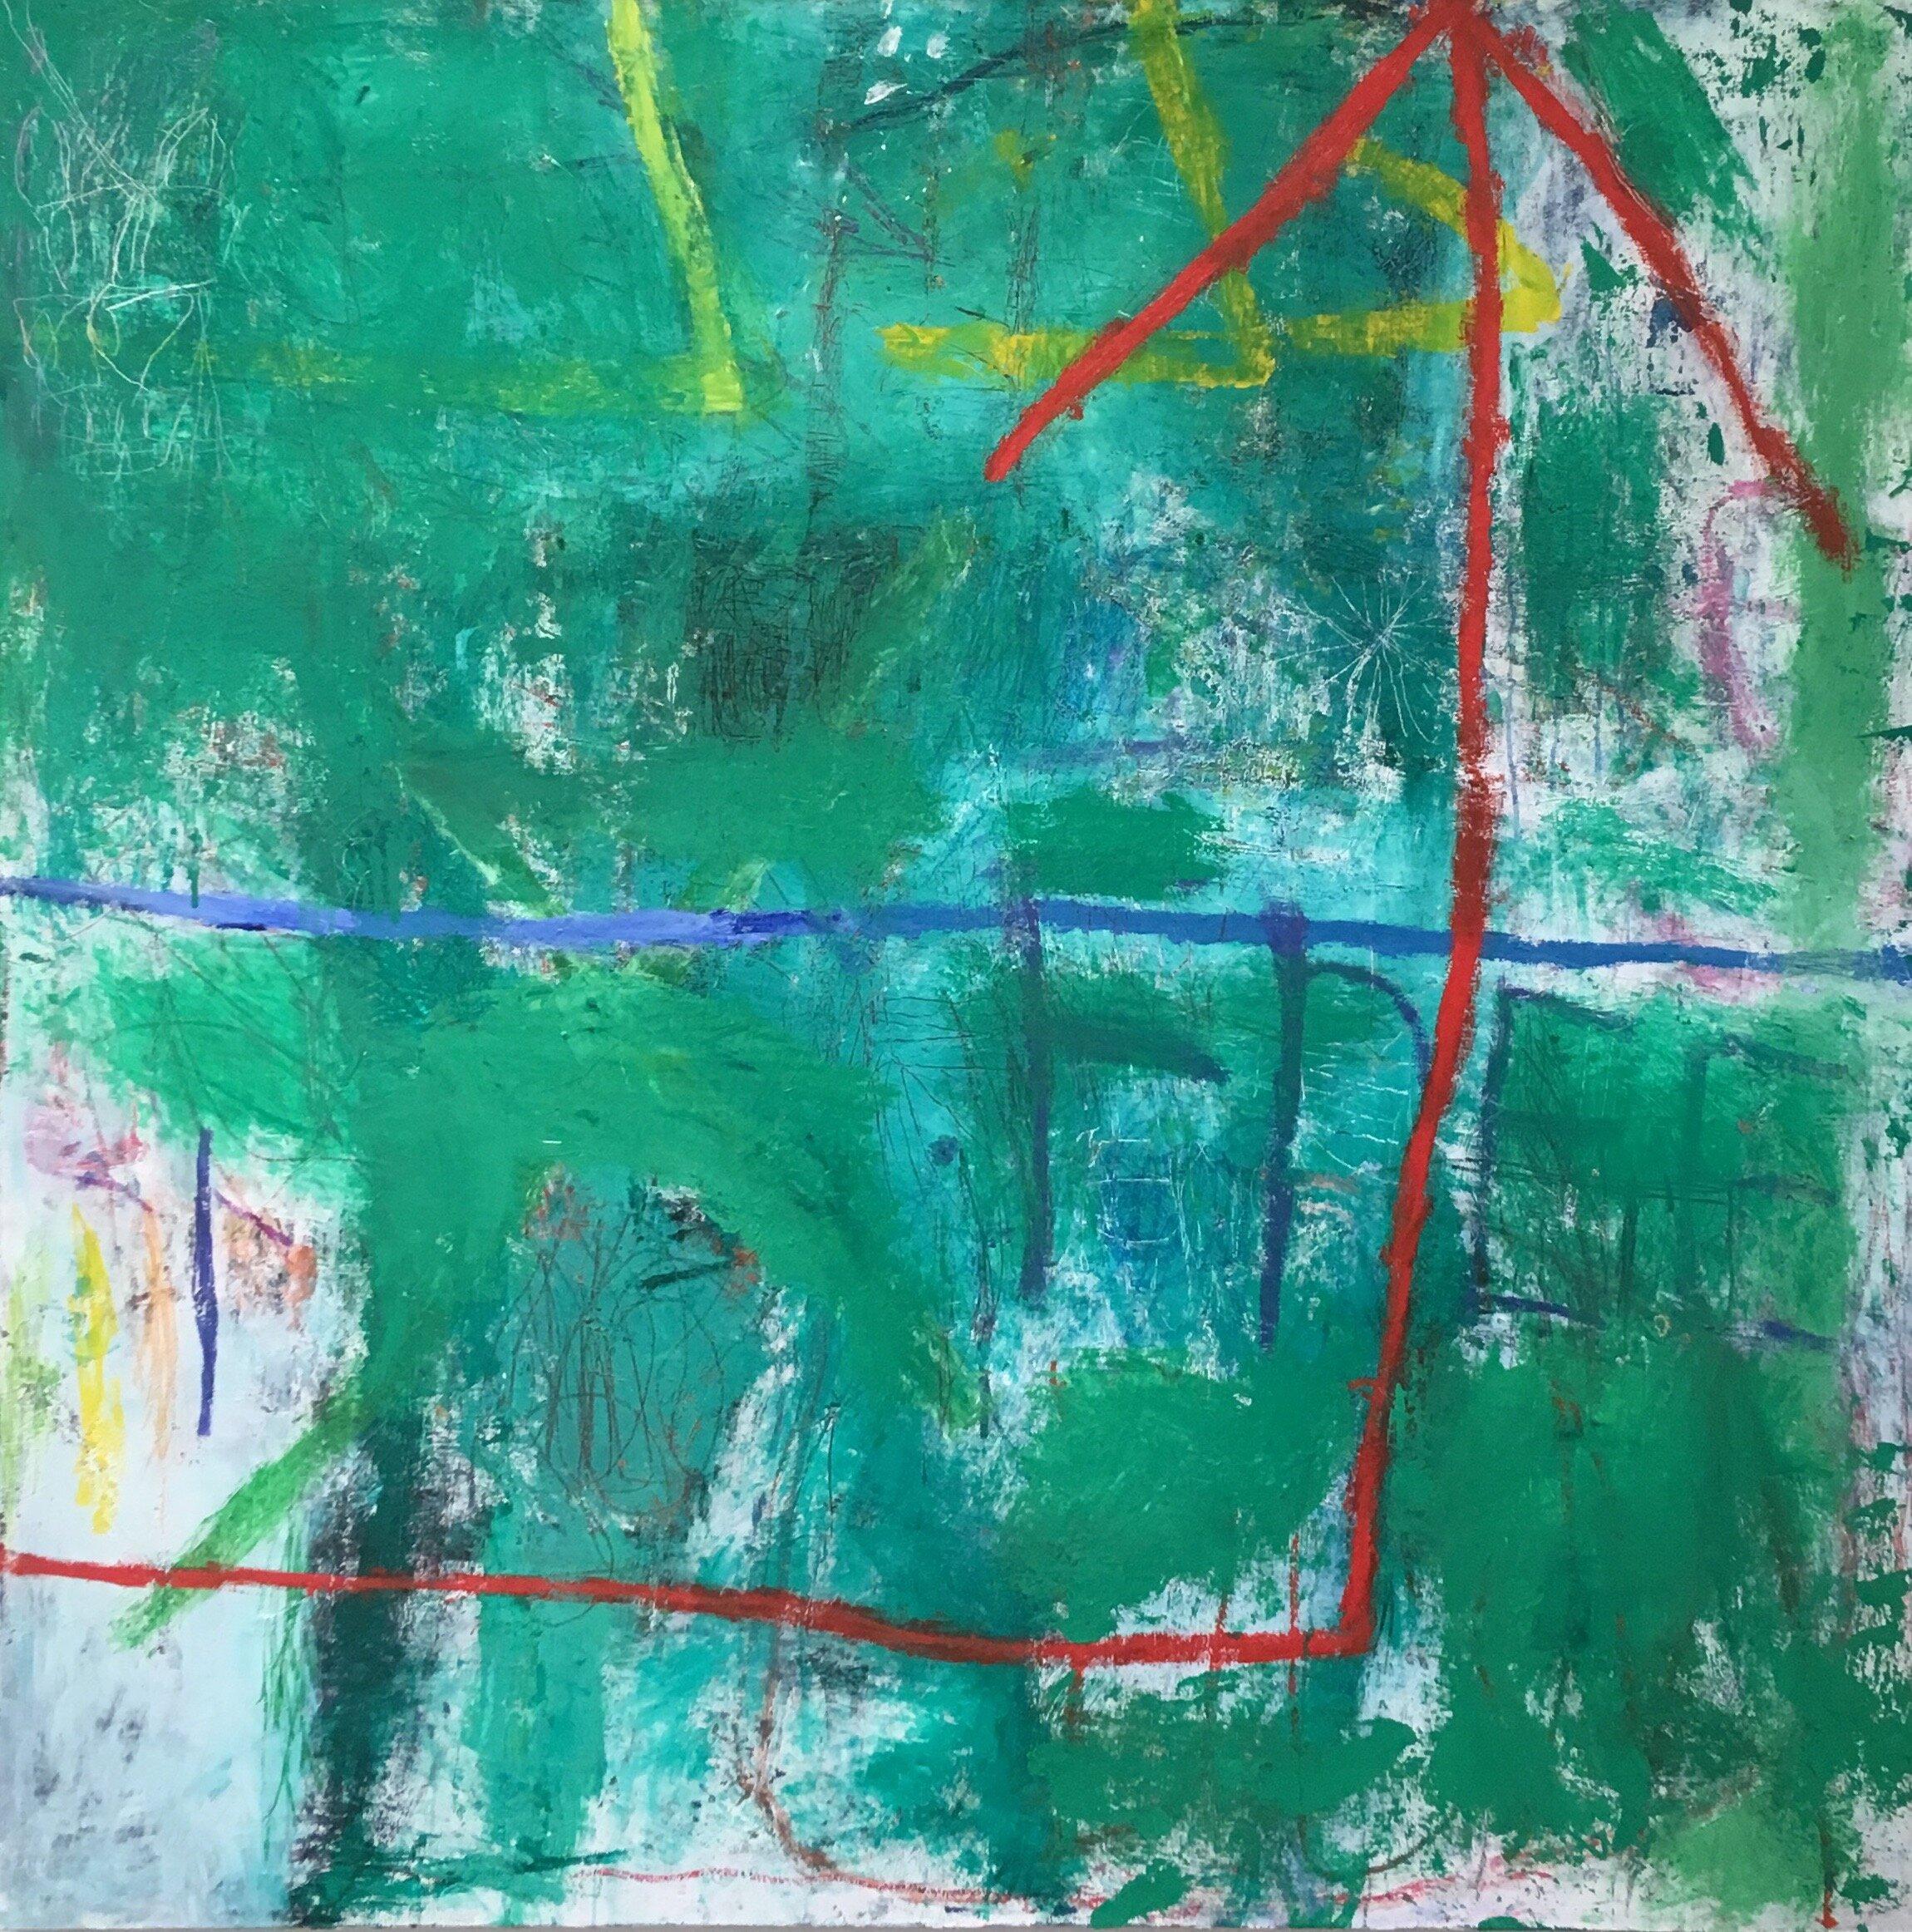 forward 72x72 in oil on canvas 2019